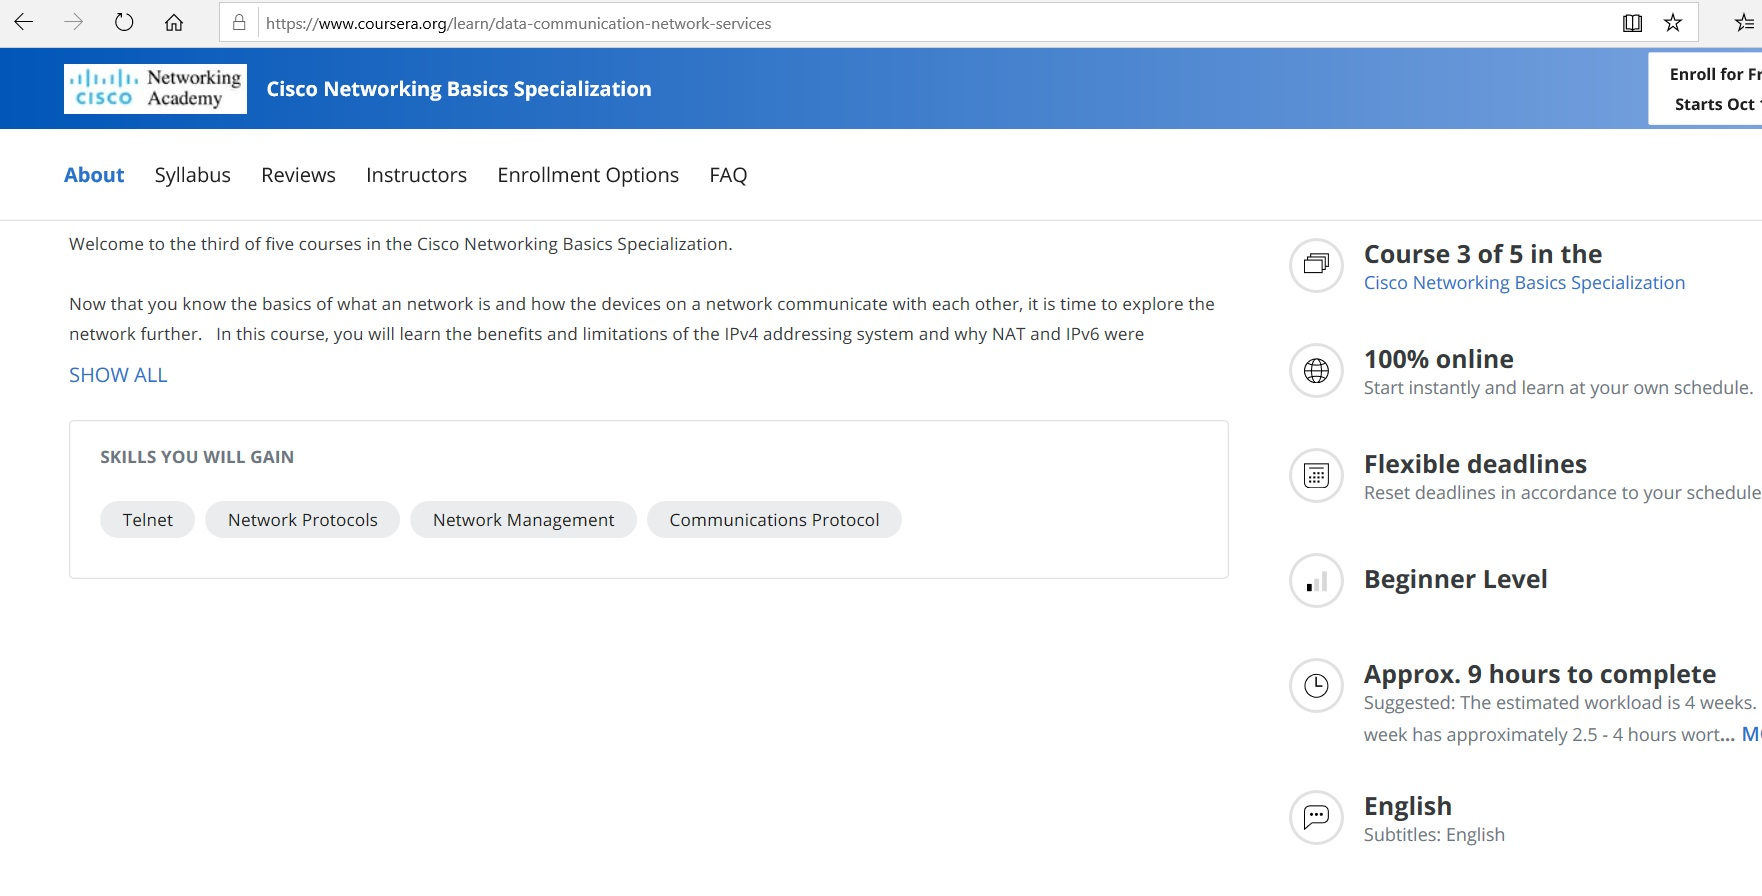 Cisco Networking Basics Specialization course details.